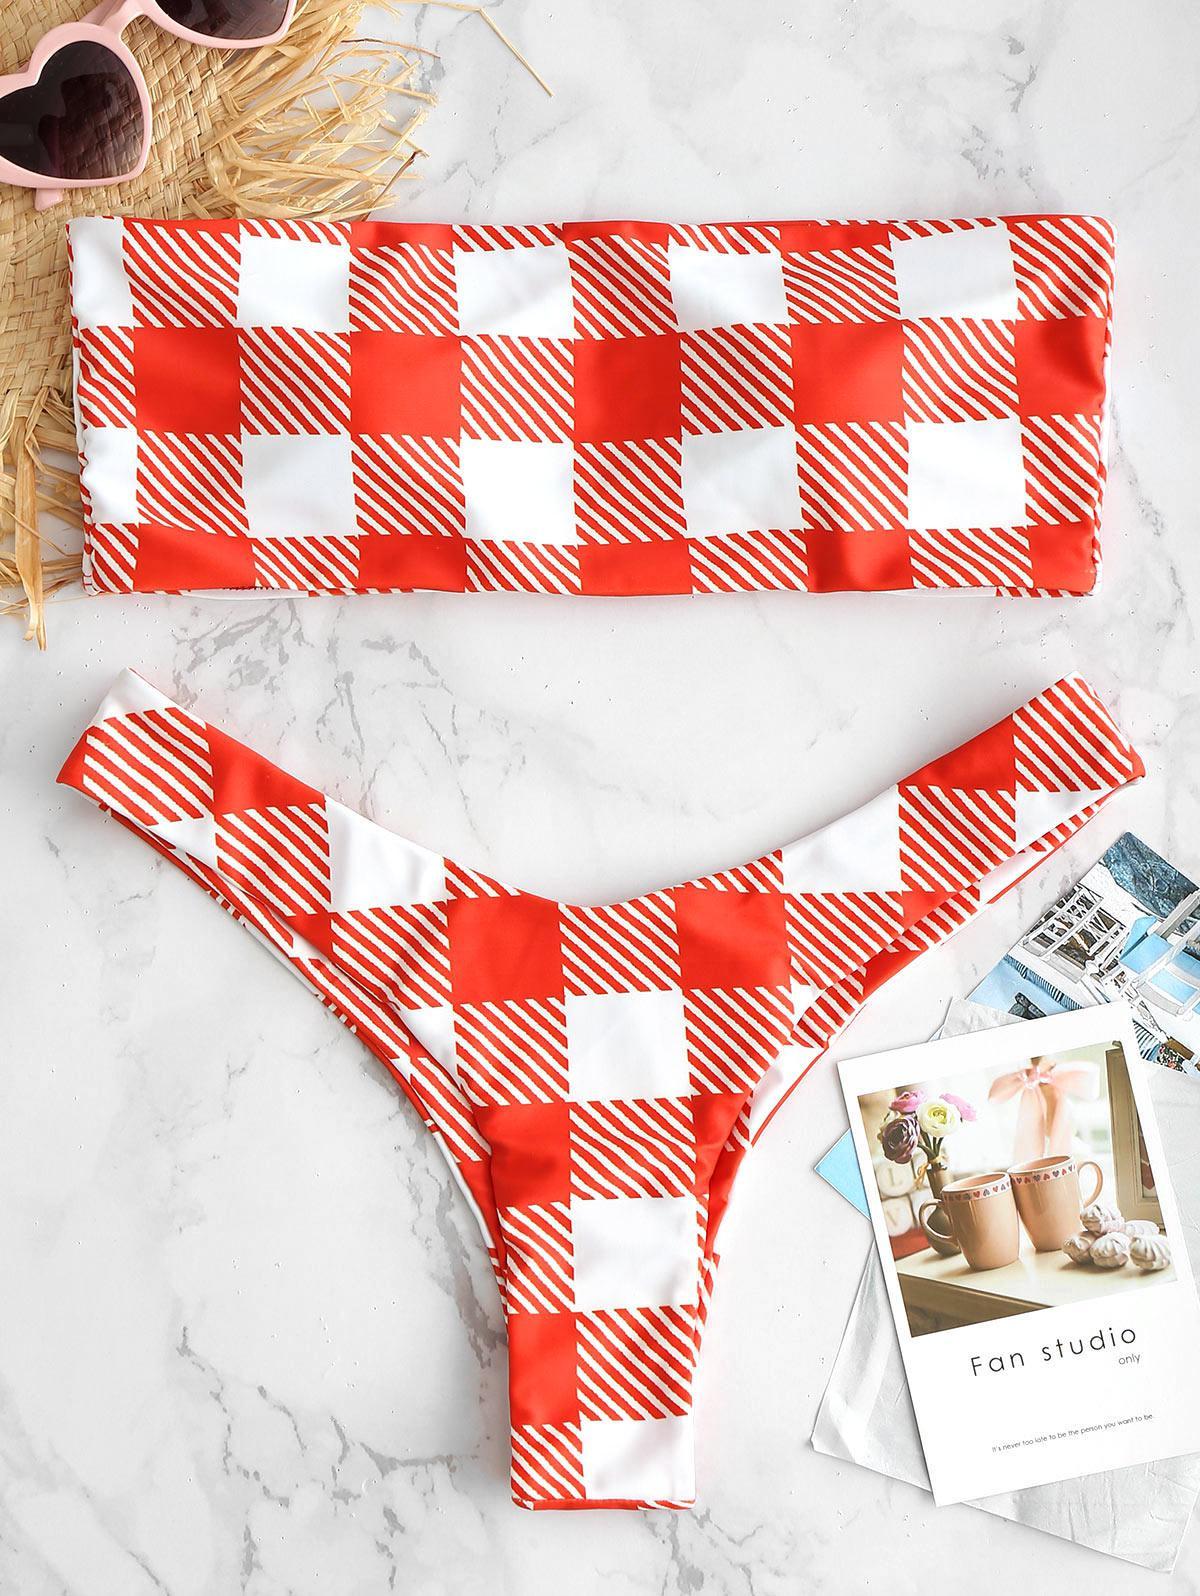 ZAFUL Plaid High Cut Bandeau Bikini Set, Multi-a